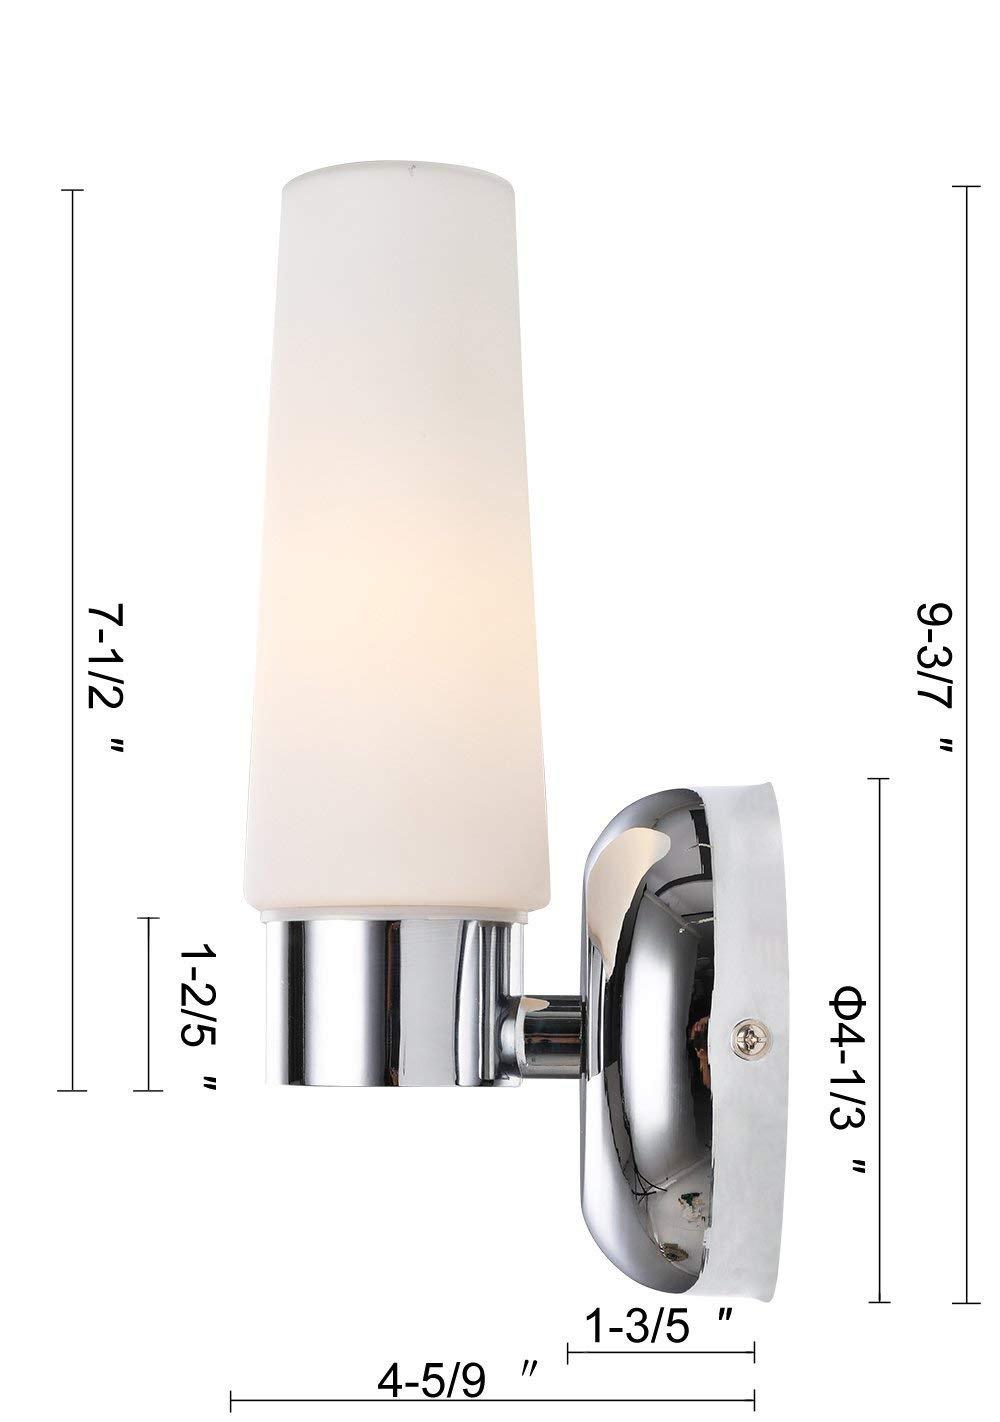 WAC Lighting MP-559-MR//BN Micha 1-Light Mini-Pendant Brushed Nickel Finish with Mirror Art Glass Shade